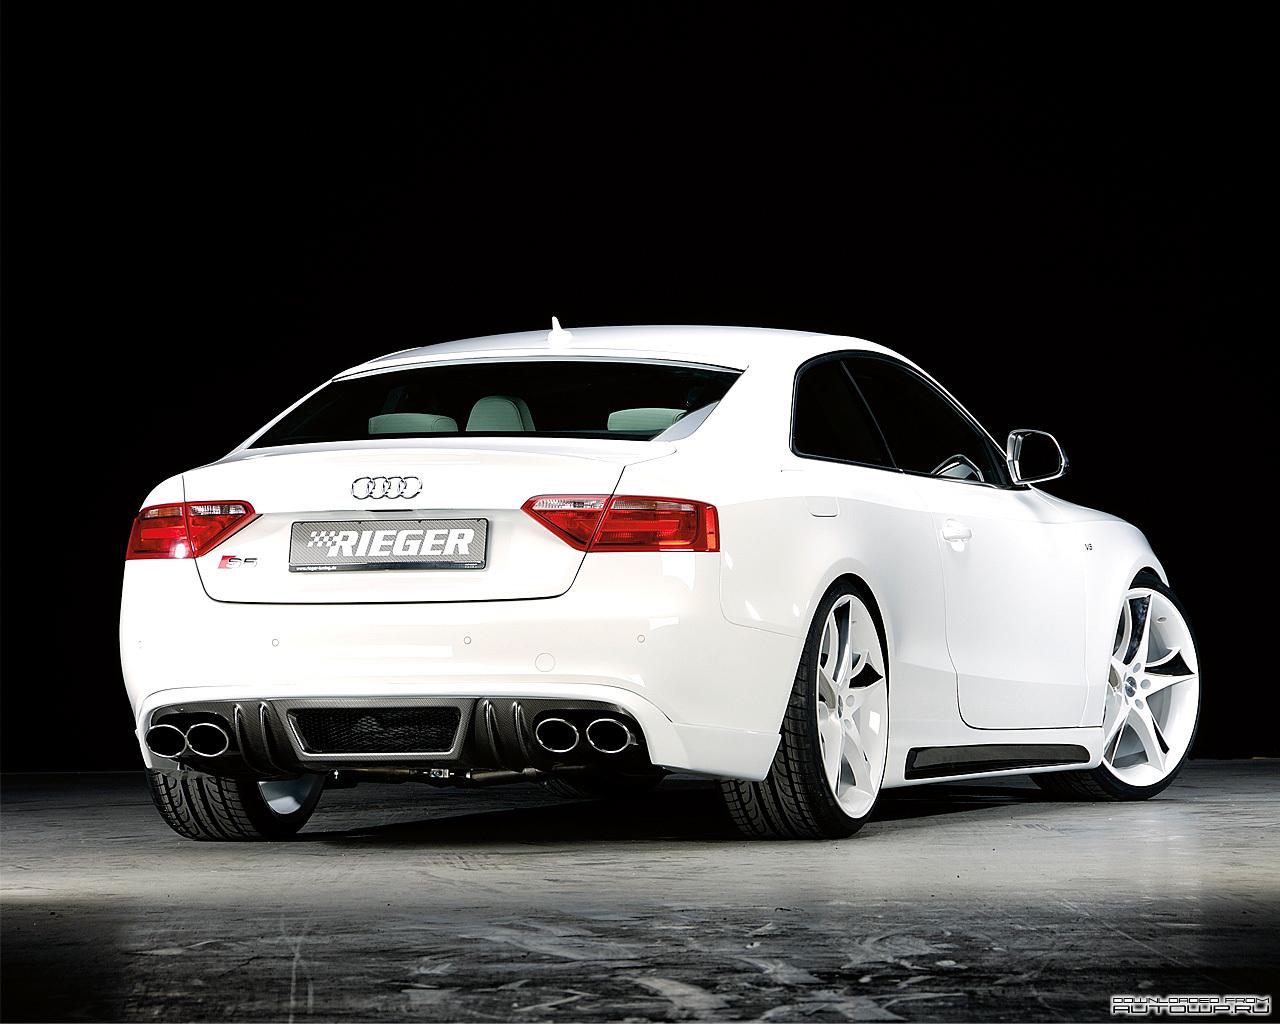 Audi s5 2012 Blue 2012 Audi s5 11 Audi s5 11